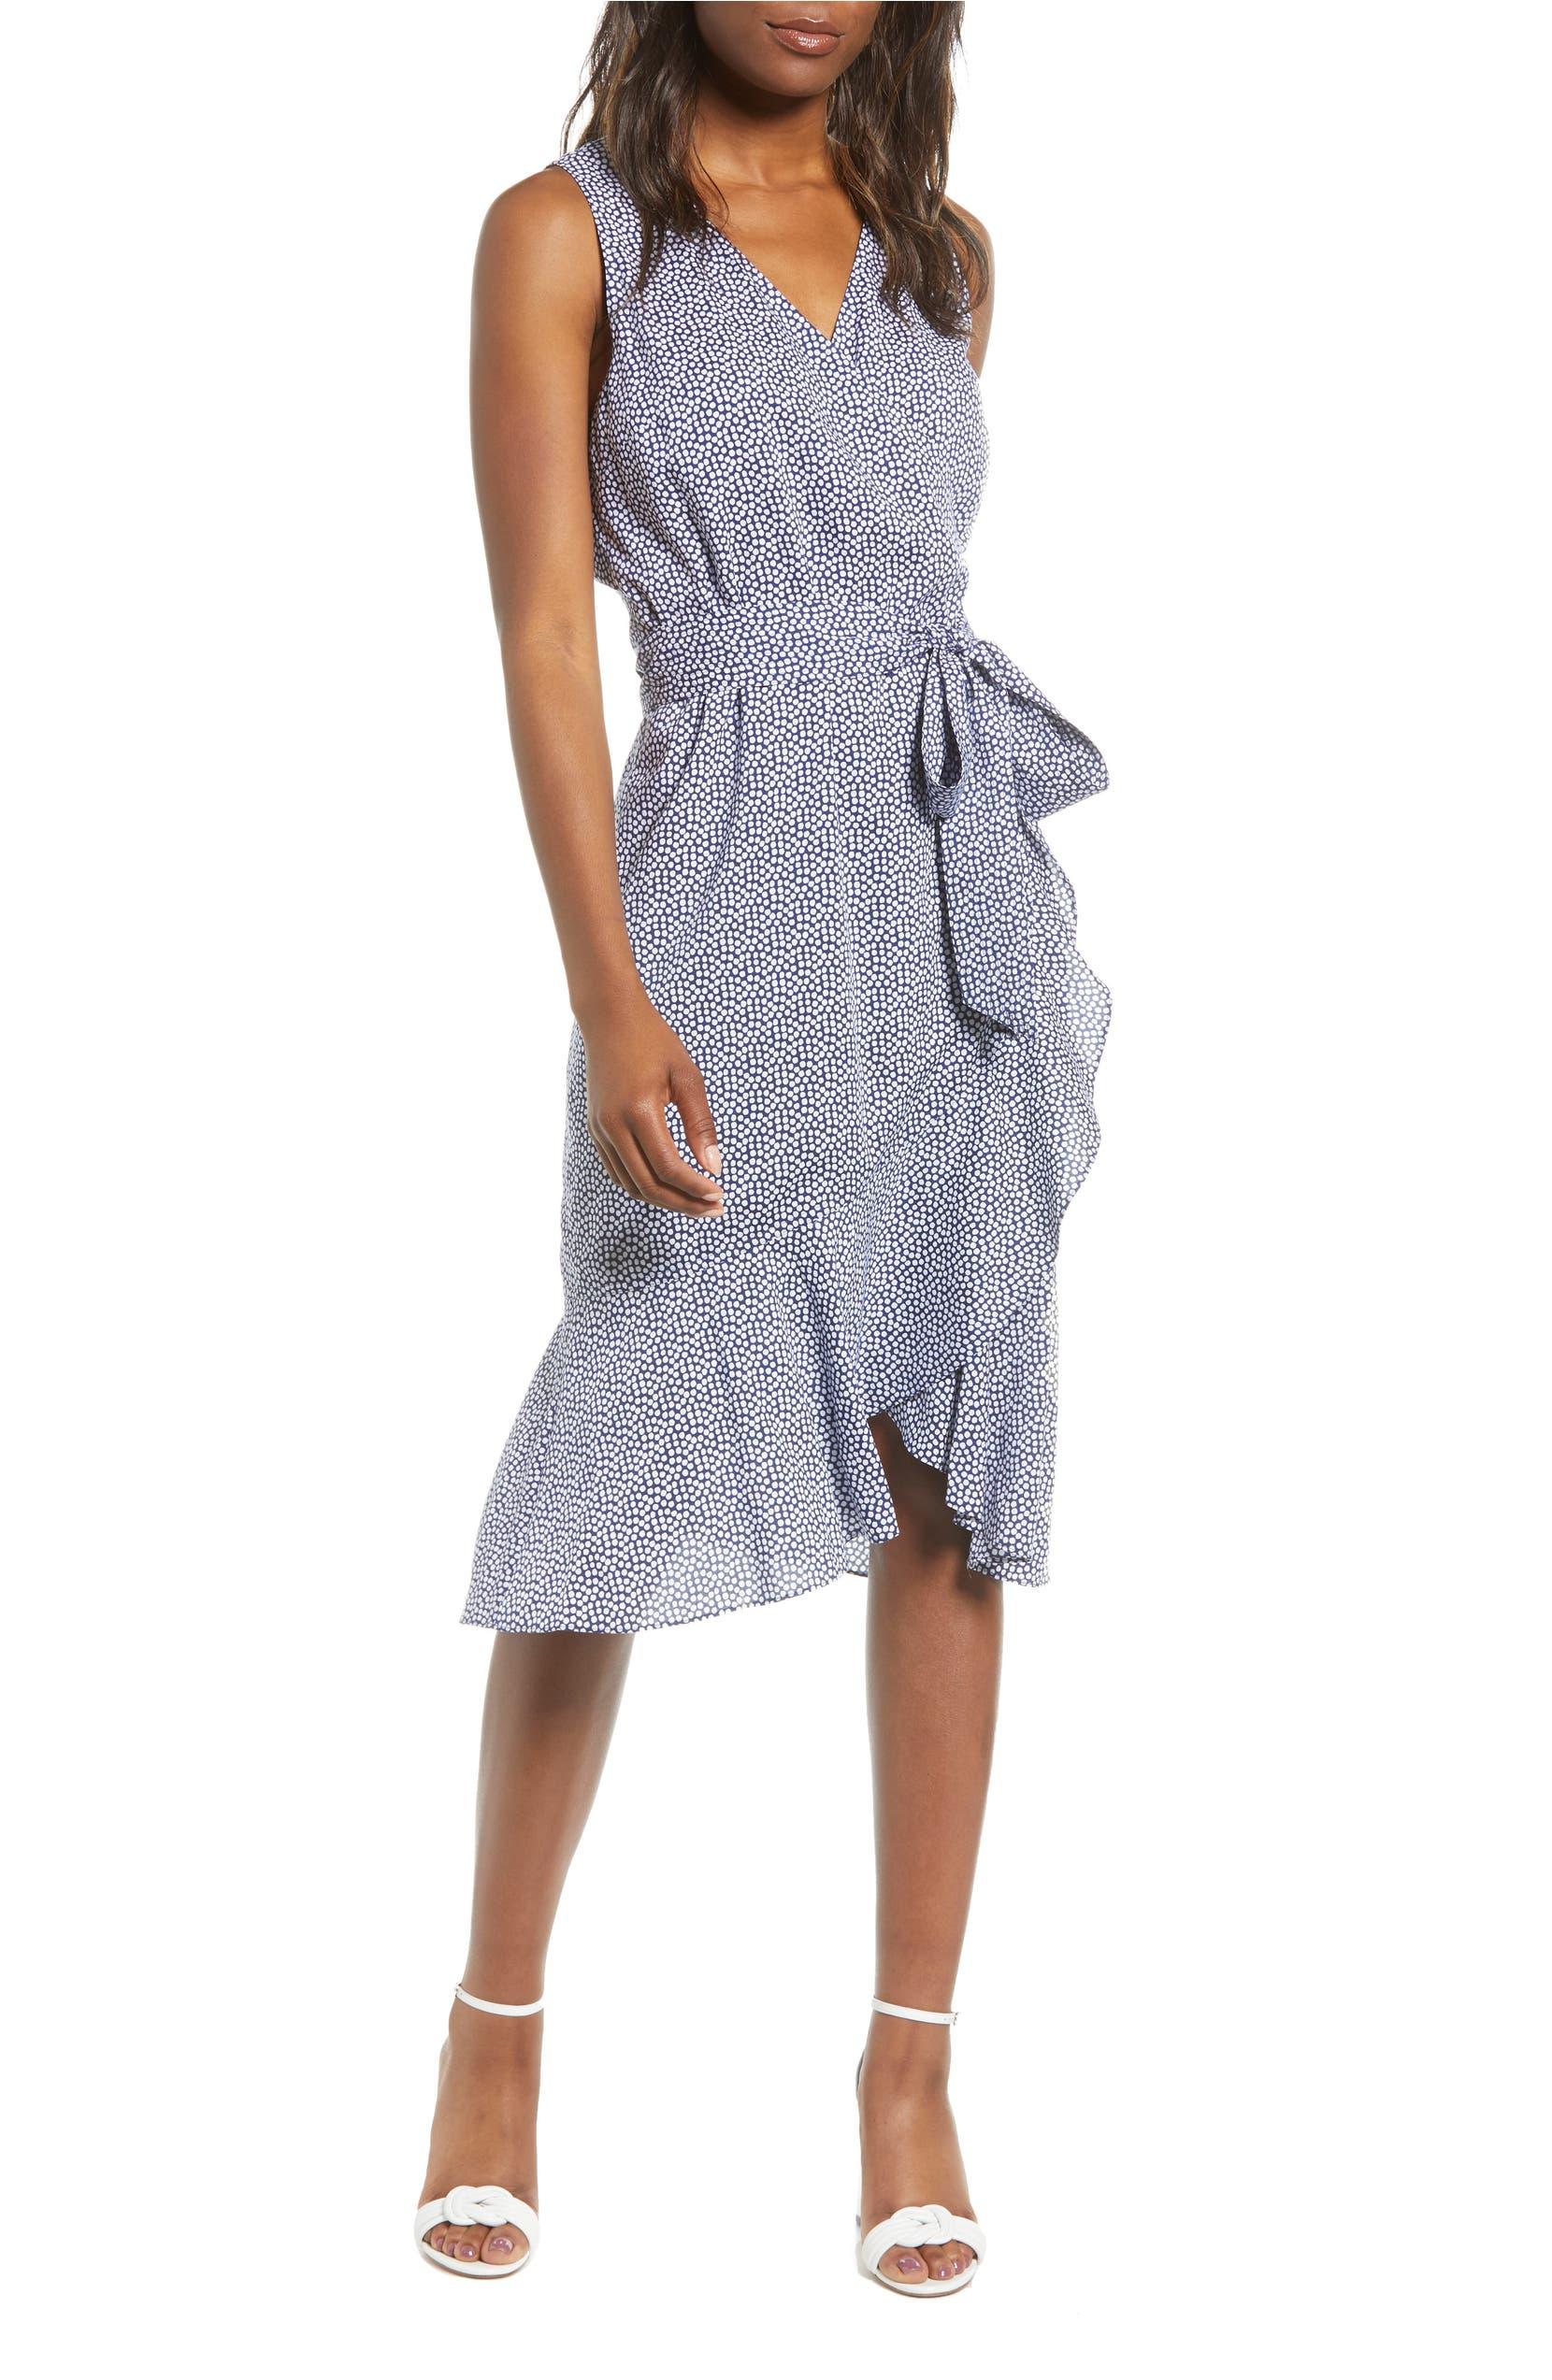 59d38017bd vineyard vines Scallop Dot Wrap Dress | Nordstrom